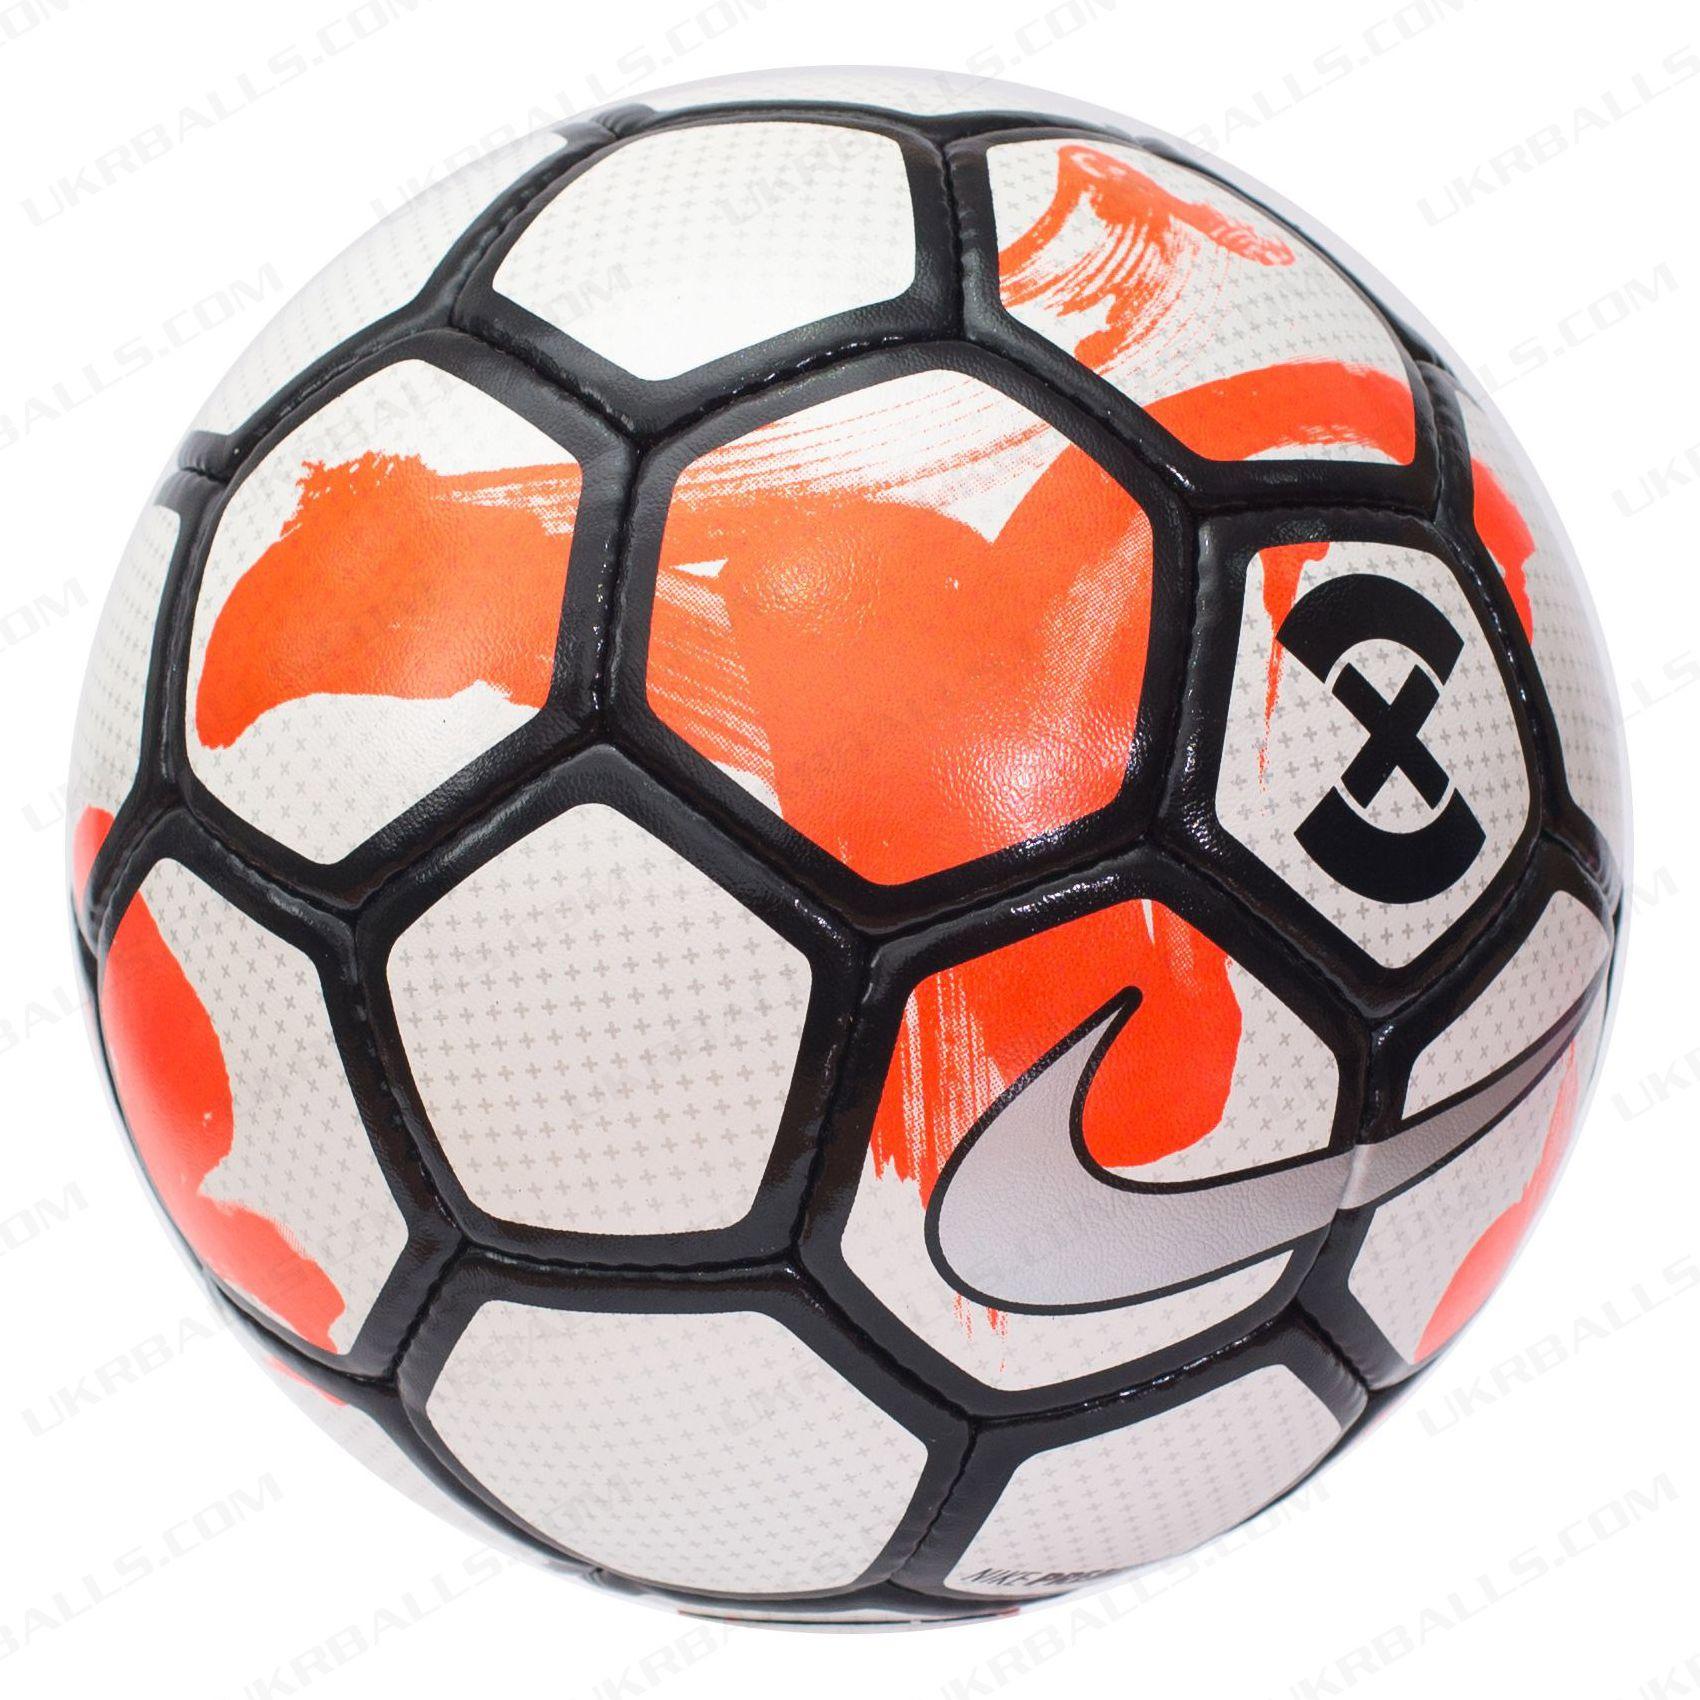 Kupit Futzalnyj Myach Nike Football X Premier Fifa Sc3051 100